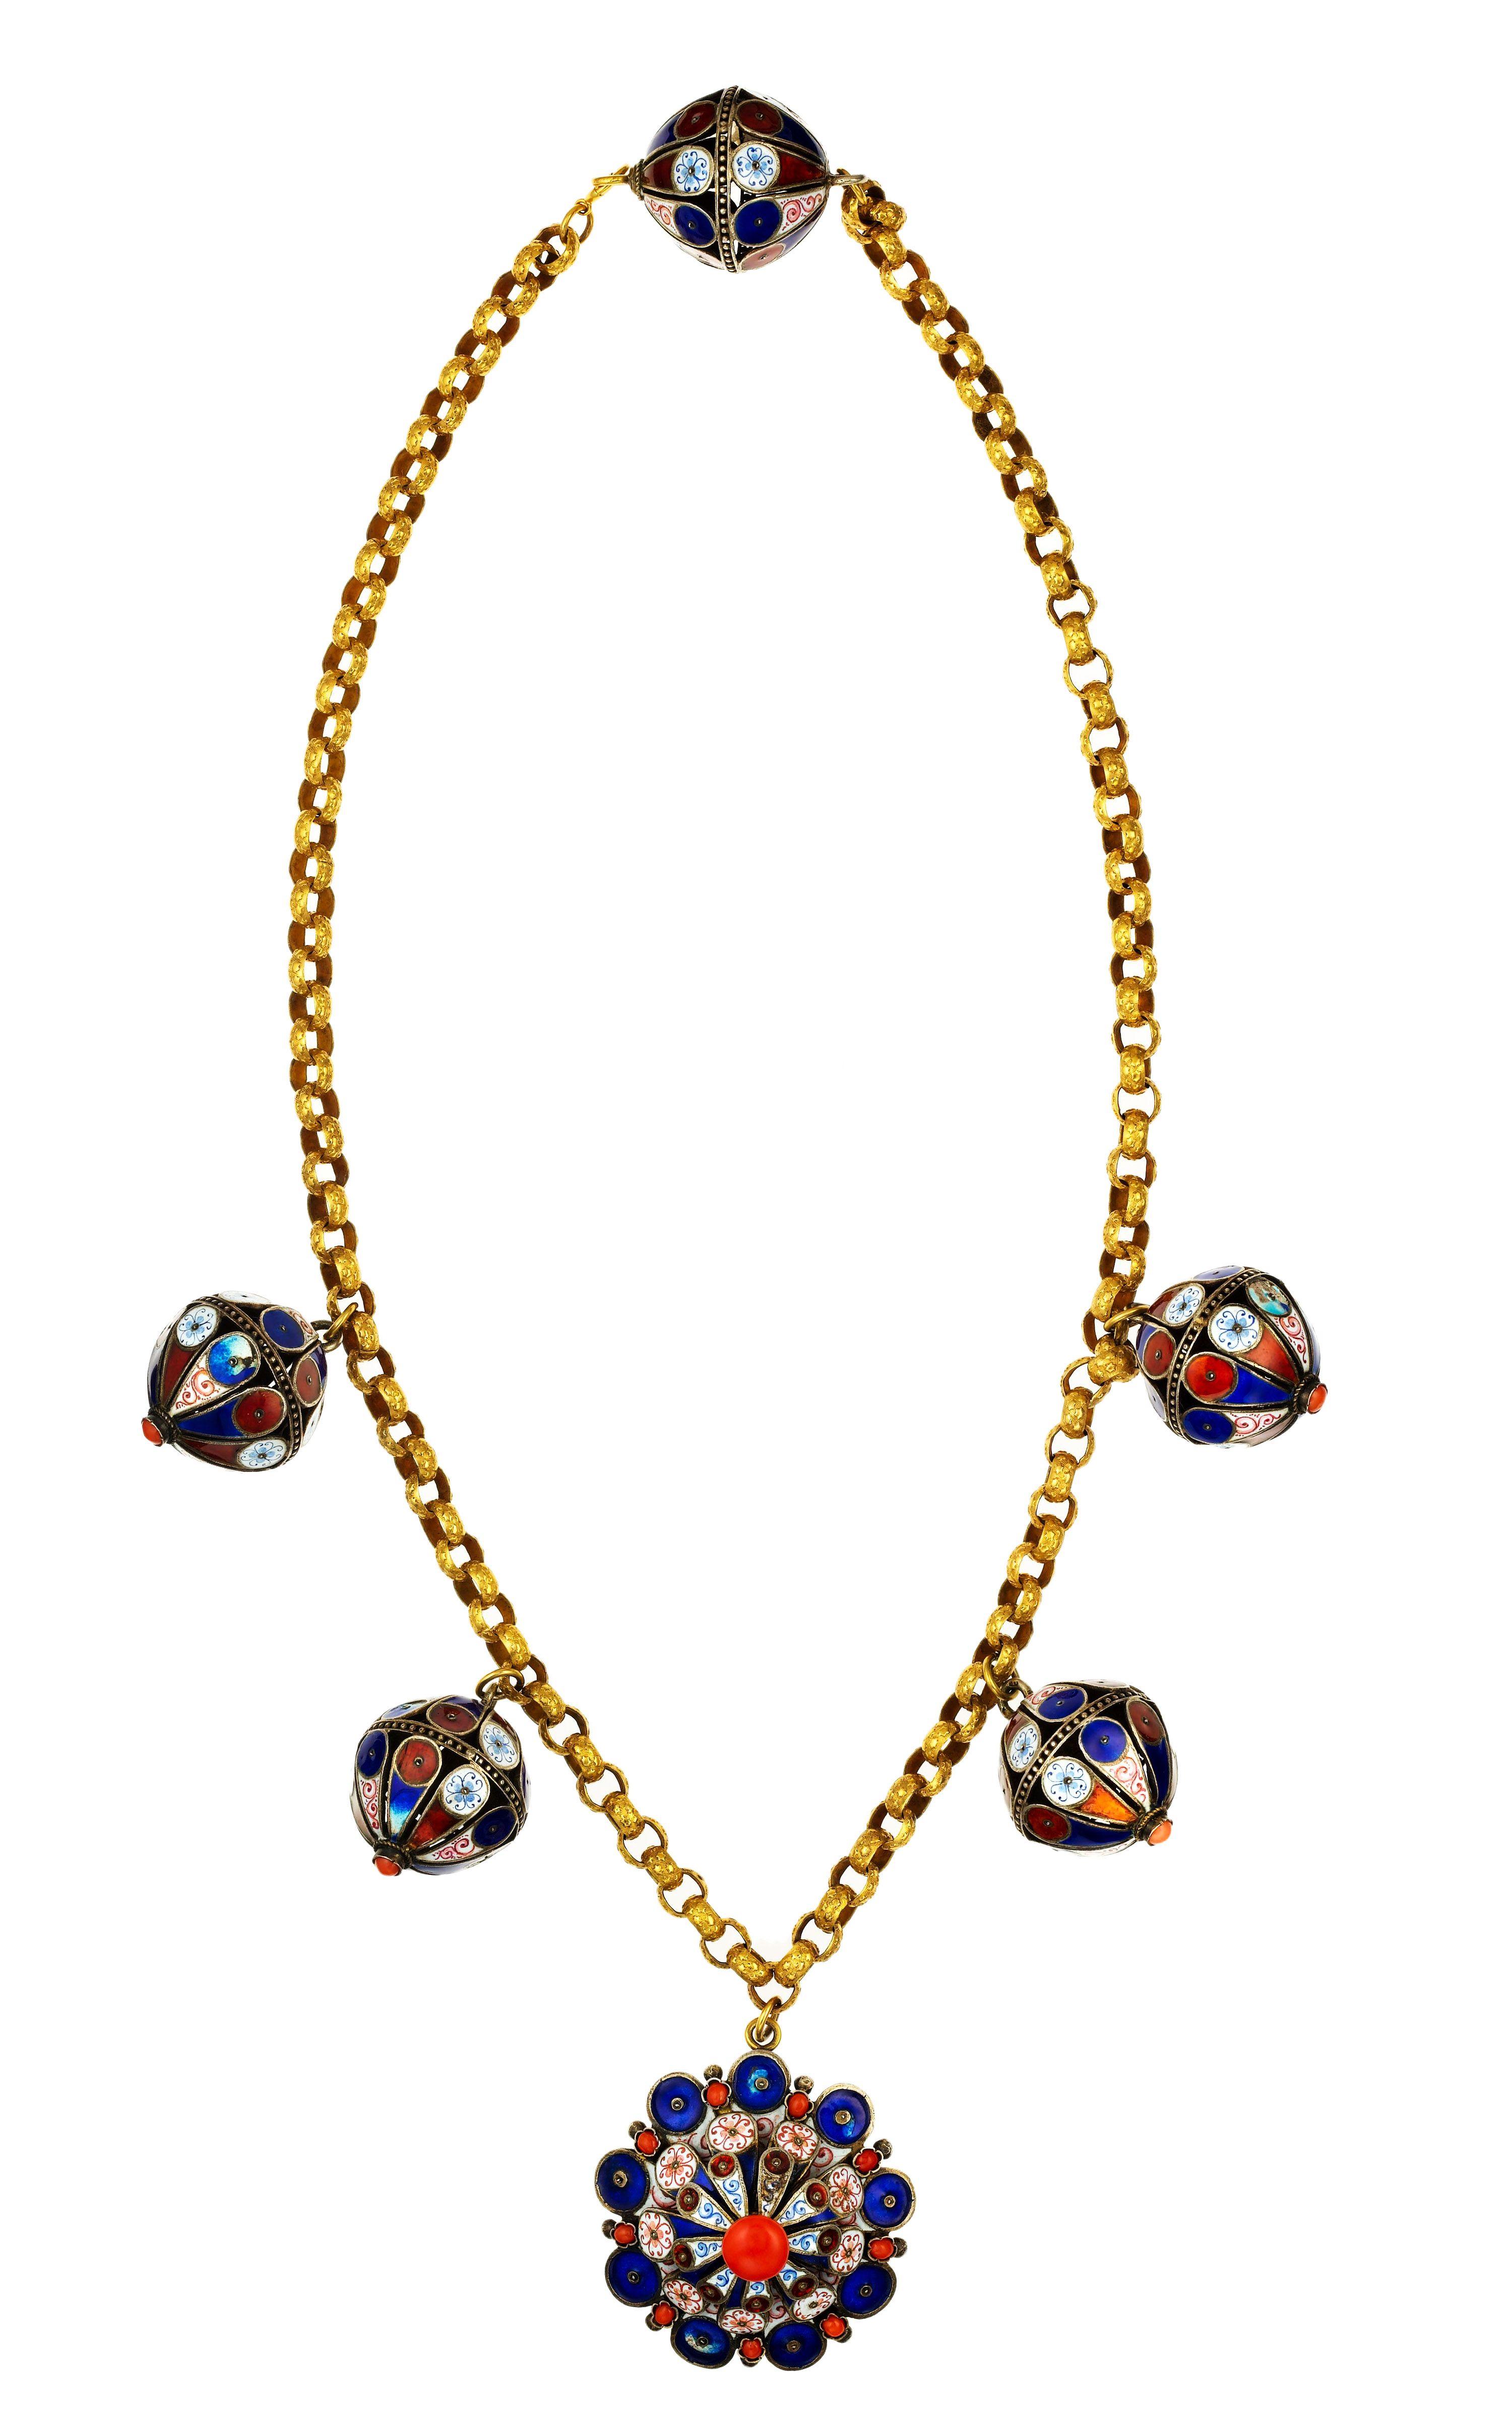 Shop Tara Compton Moorish Enamel Pendant Necklace at Moda Operandi